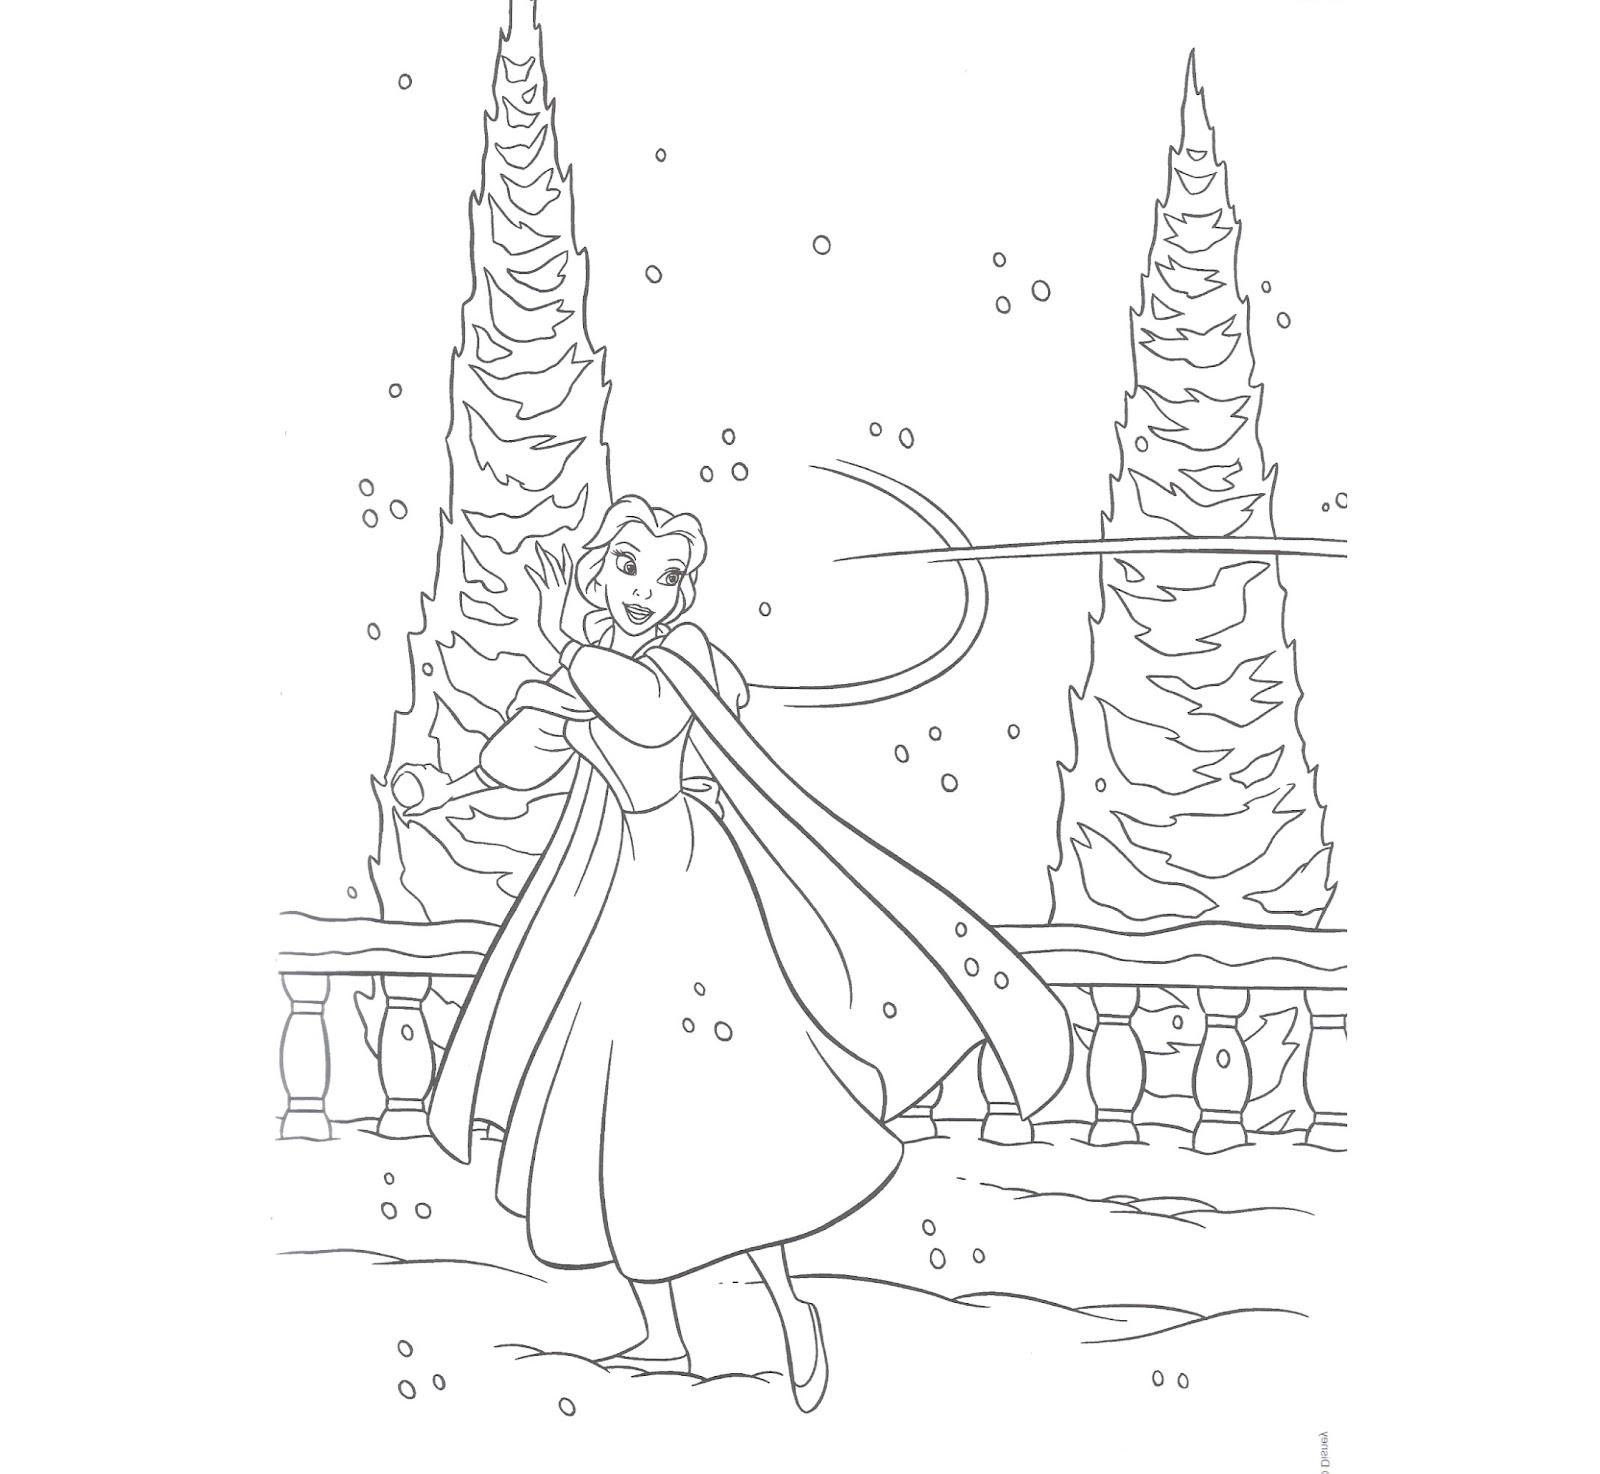 http://3.bp.blogspot.com/-xi_d7WnLW7U/T-GYEZhiaOI/AAAAAAAAGII/1W62nbwVk60/s1600/walt_disney_princess_anastasia_character_coloring_pages_picture_8.jpg